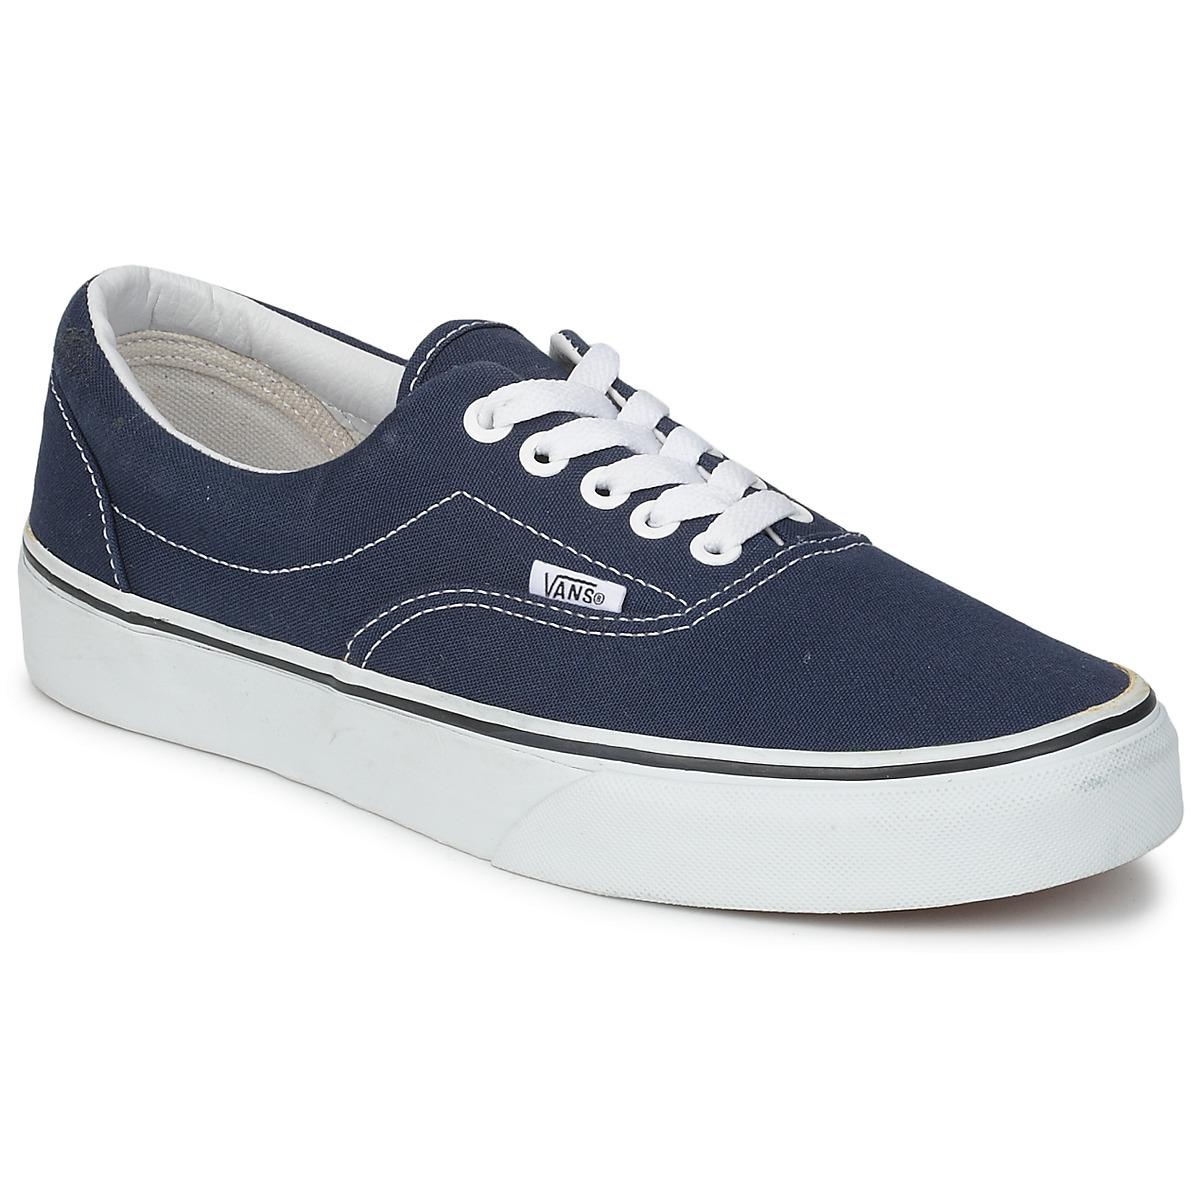 Chaussures vans - Vans u era 59 baskets mode mixte adulte ...